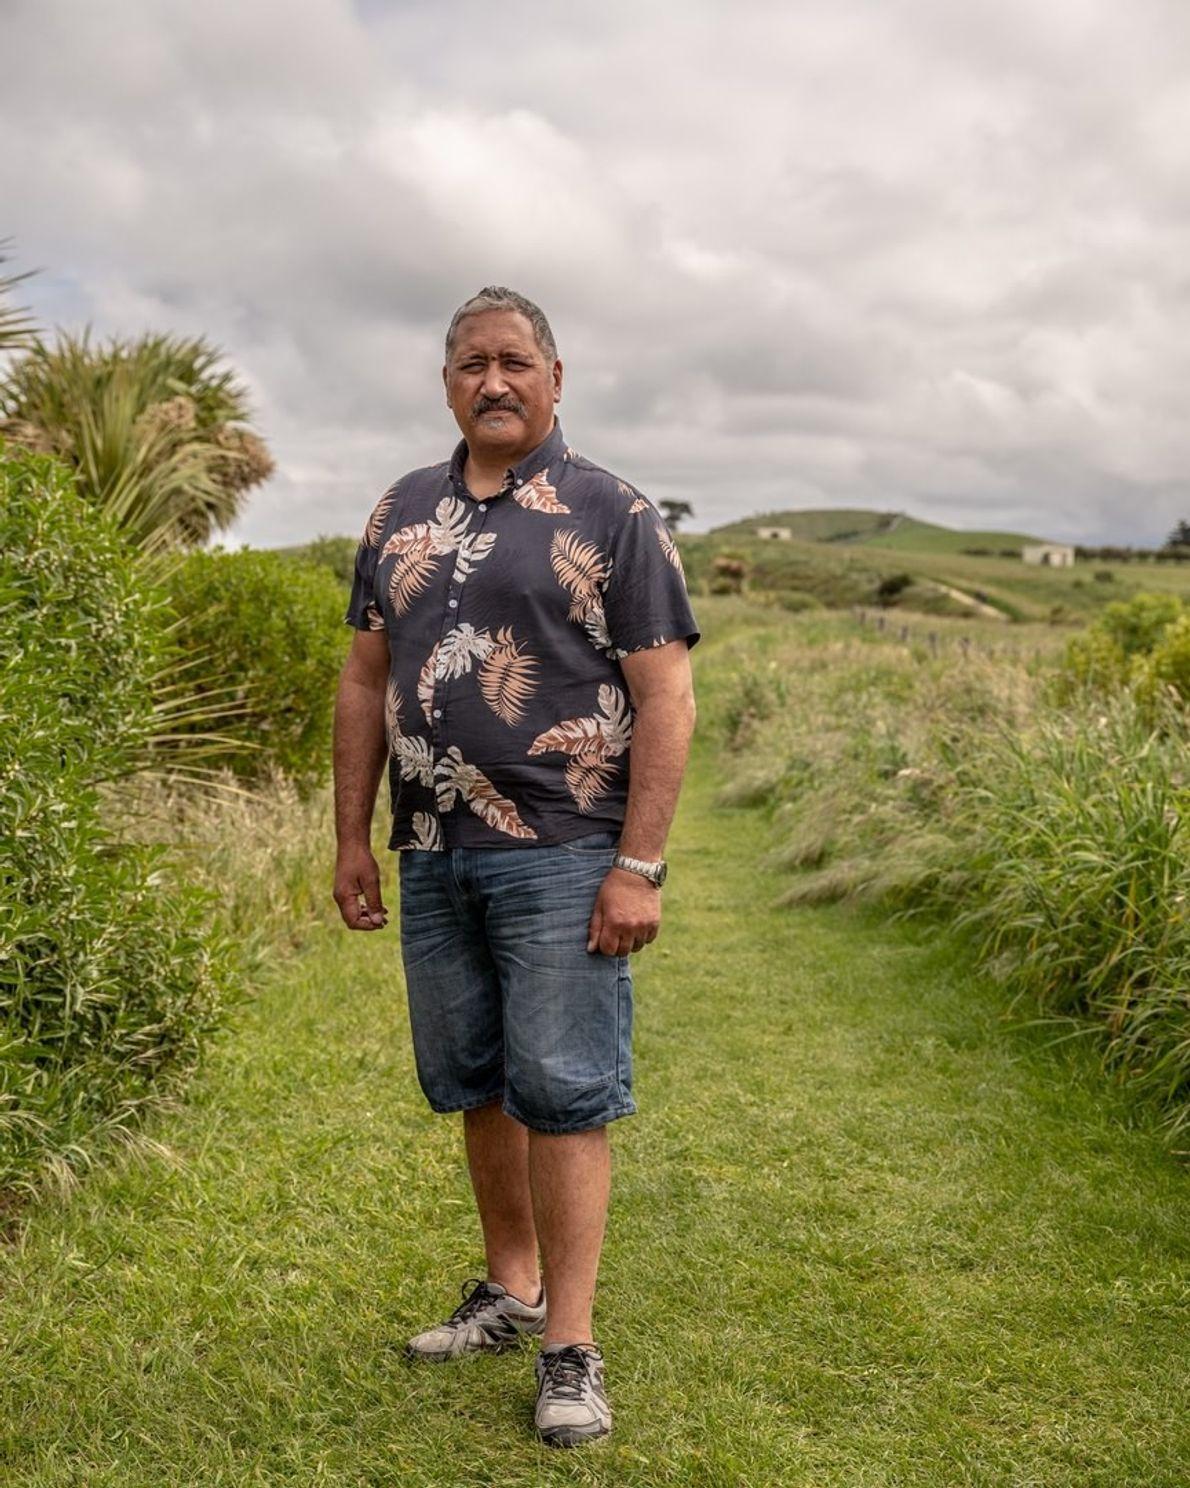 Brett Cowan New Zealand, Portraits